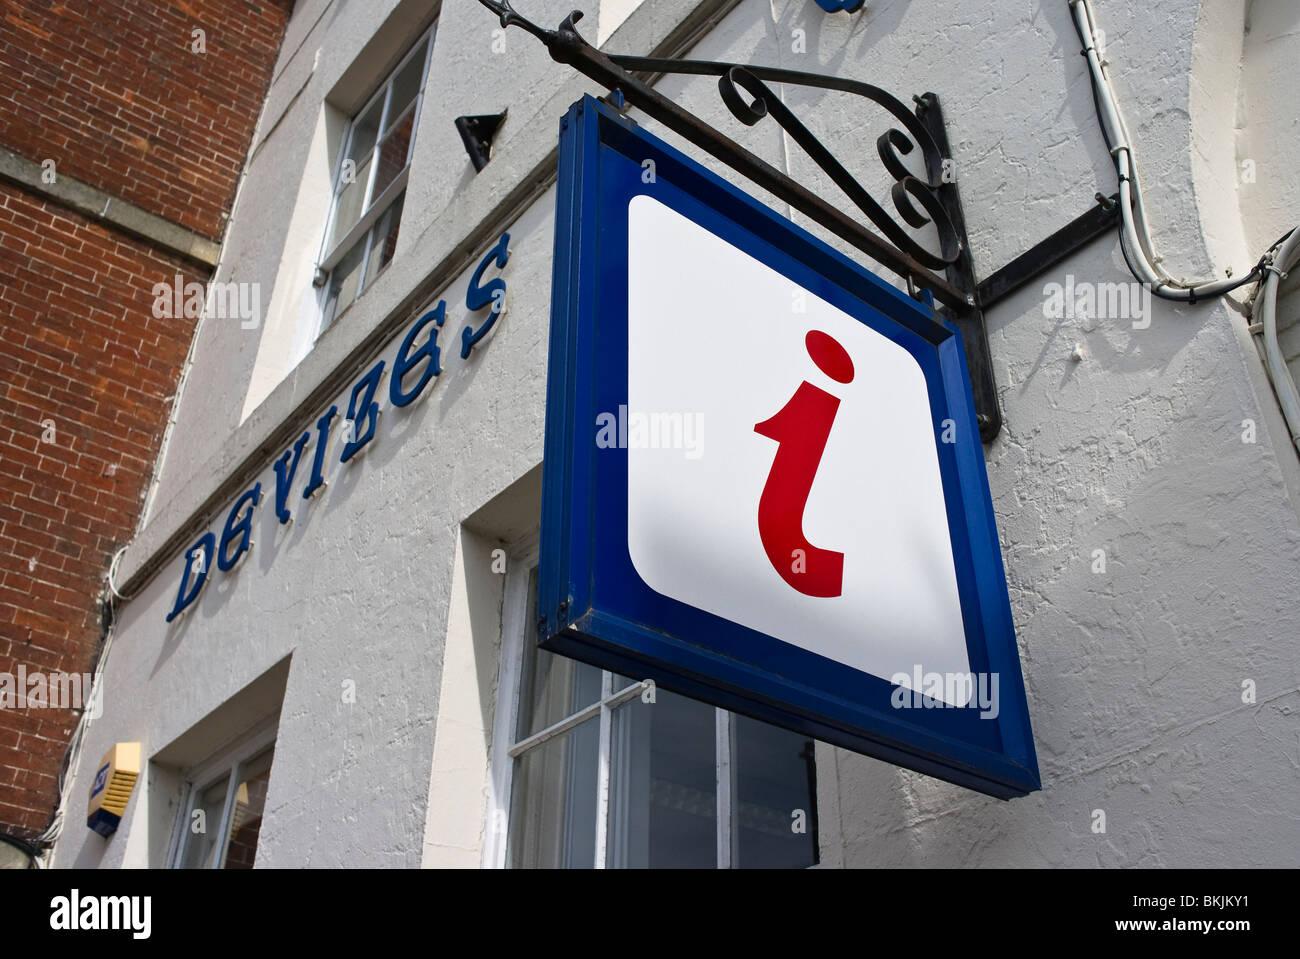 'i' symbol for Information Centre here in Devizes Wiltshire England UK EU - Stock Image